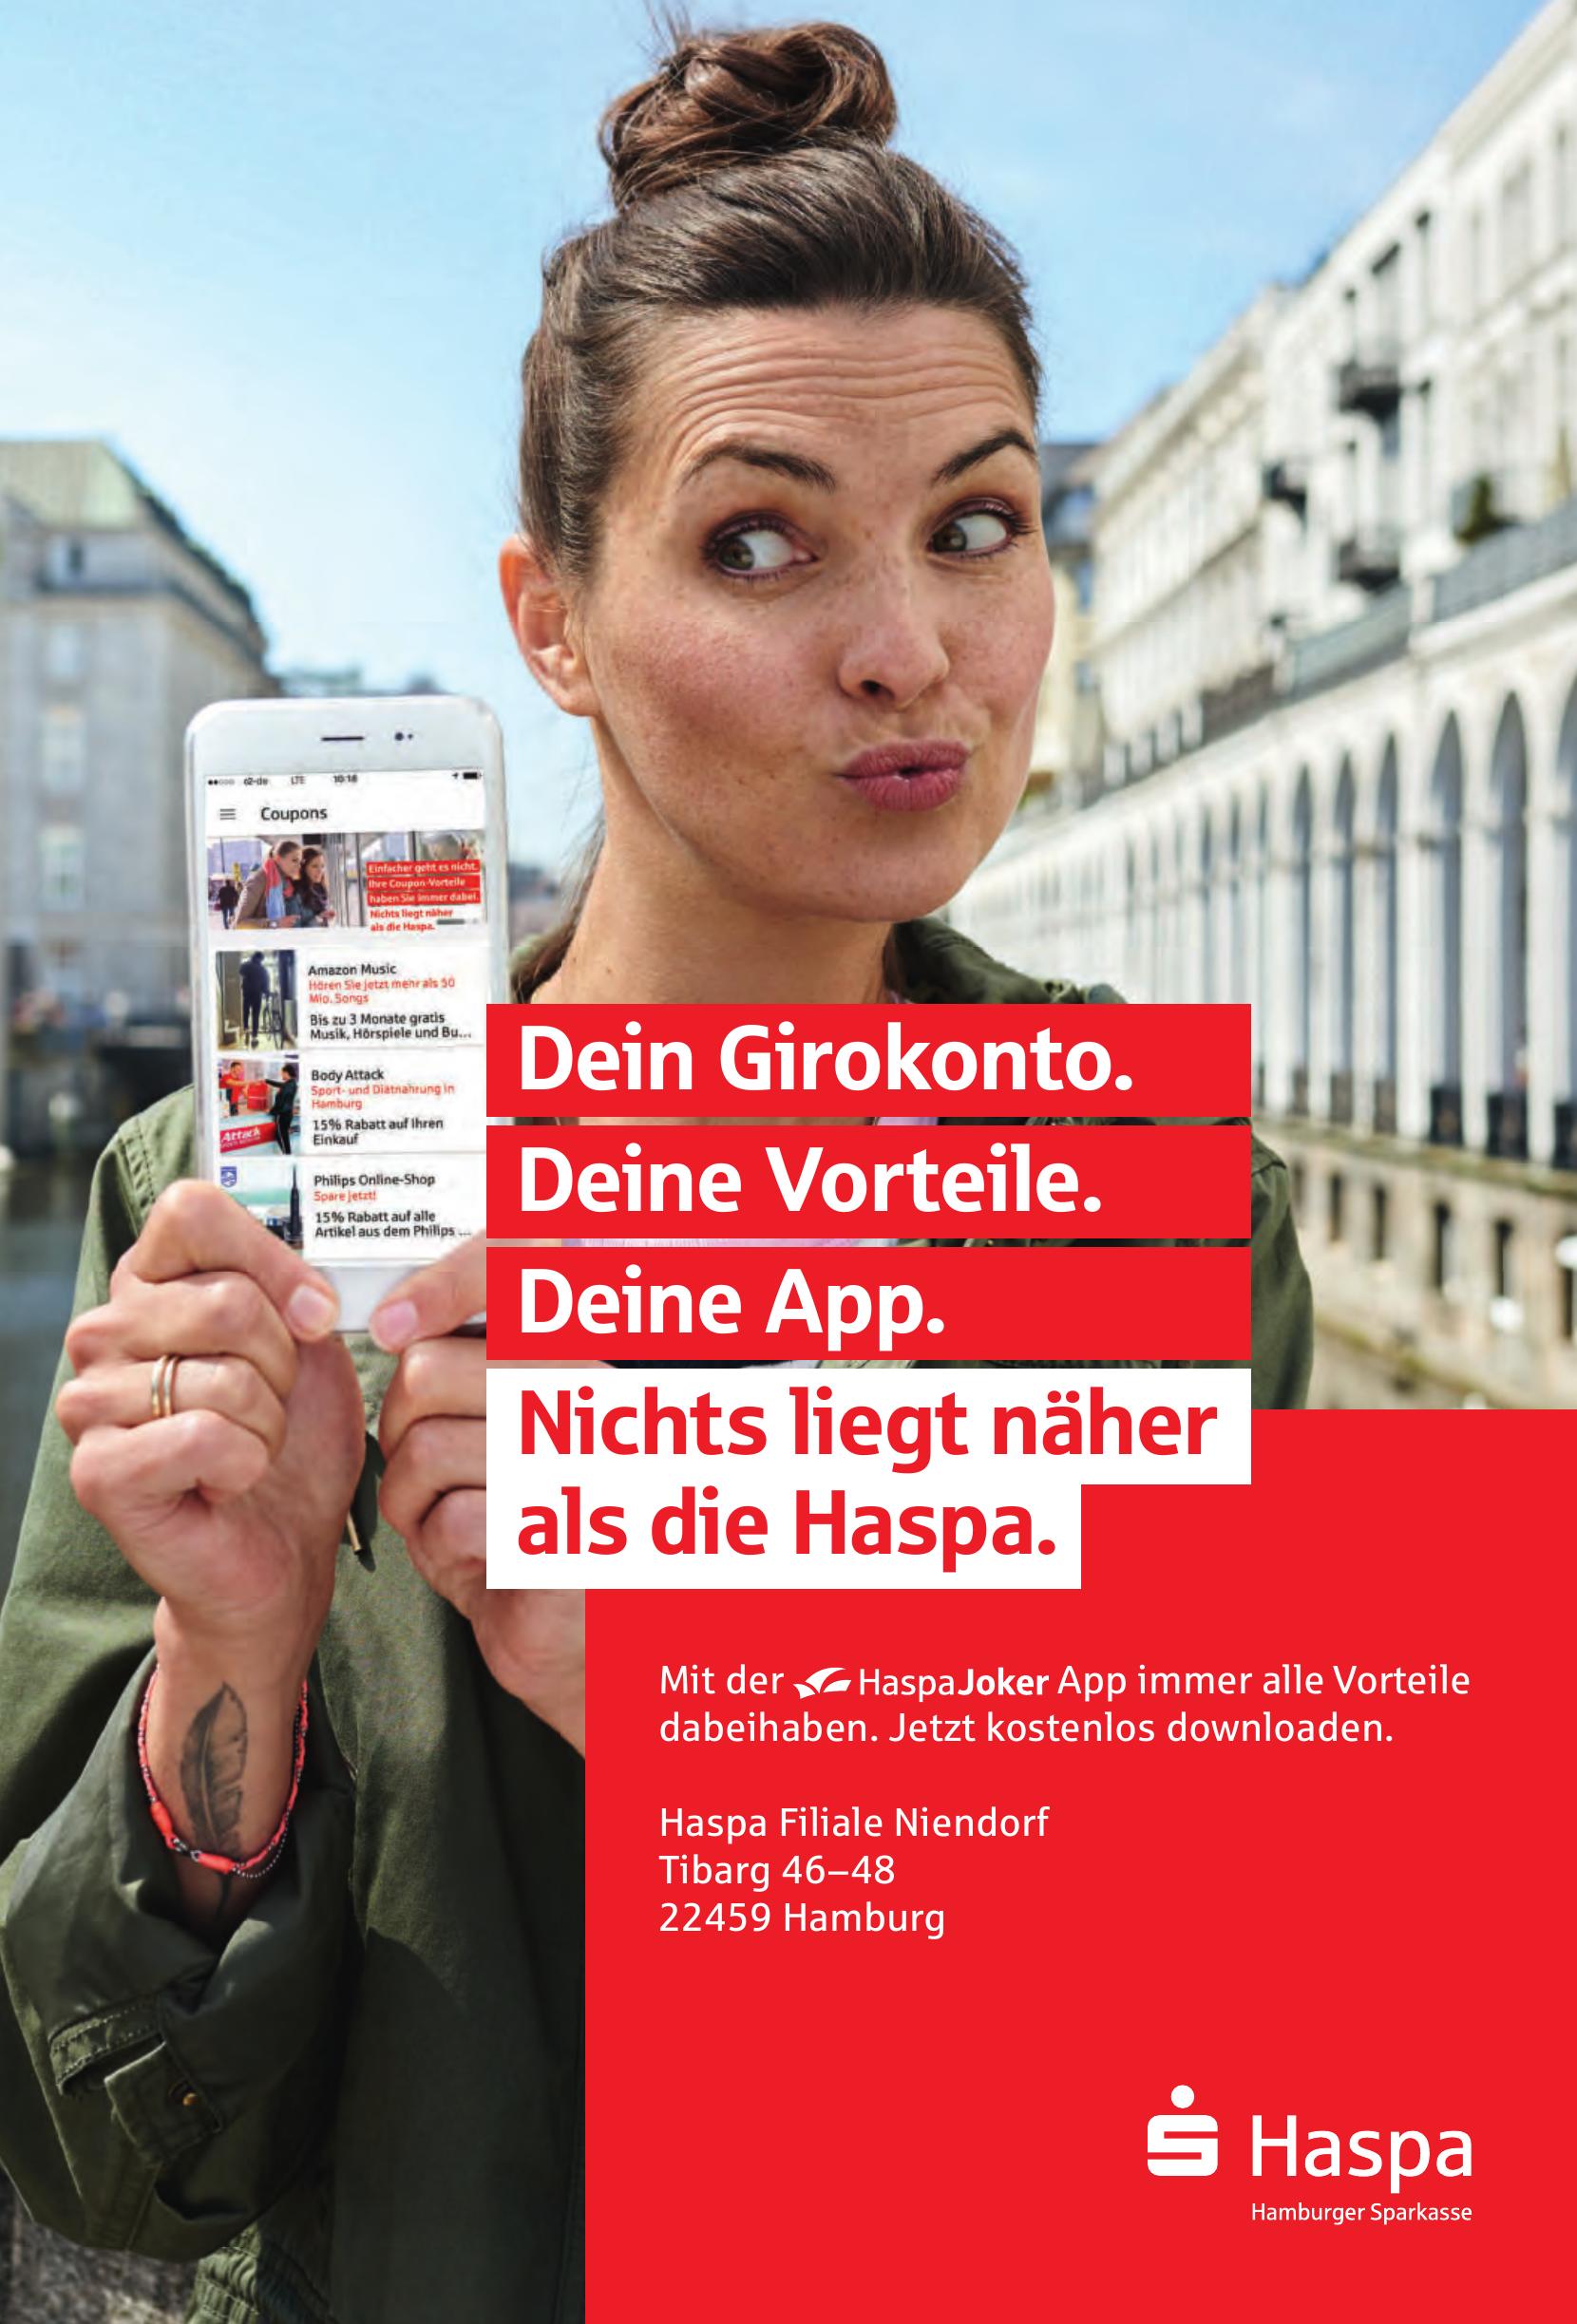 Haspa Filiale Niendorf